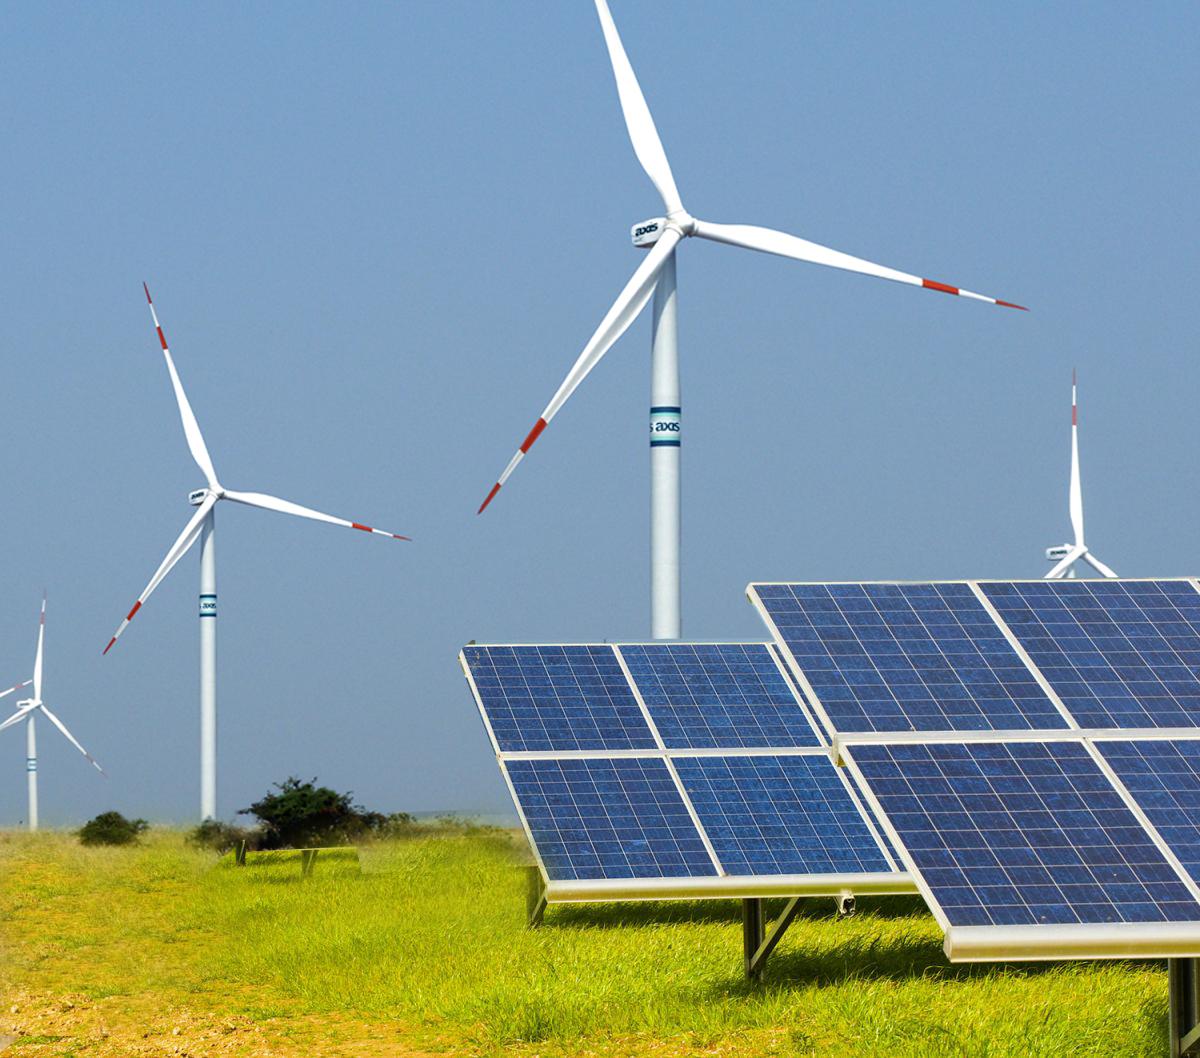 Hybrid Energy Storage Solar Energy | Wind Energy Hybrid Energy Solutions|Hybrid Energy